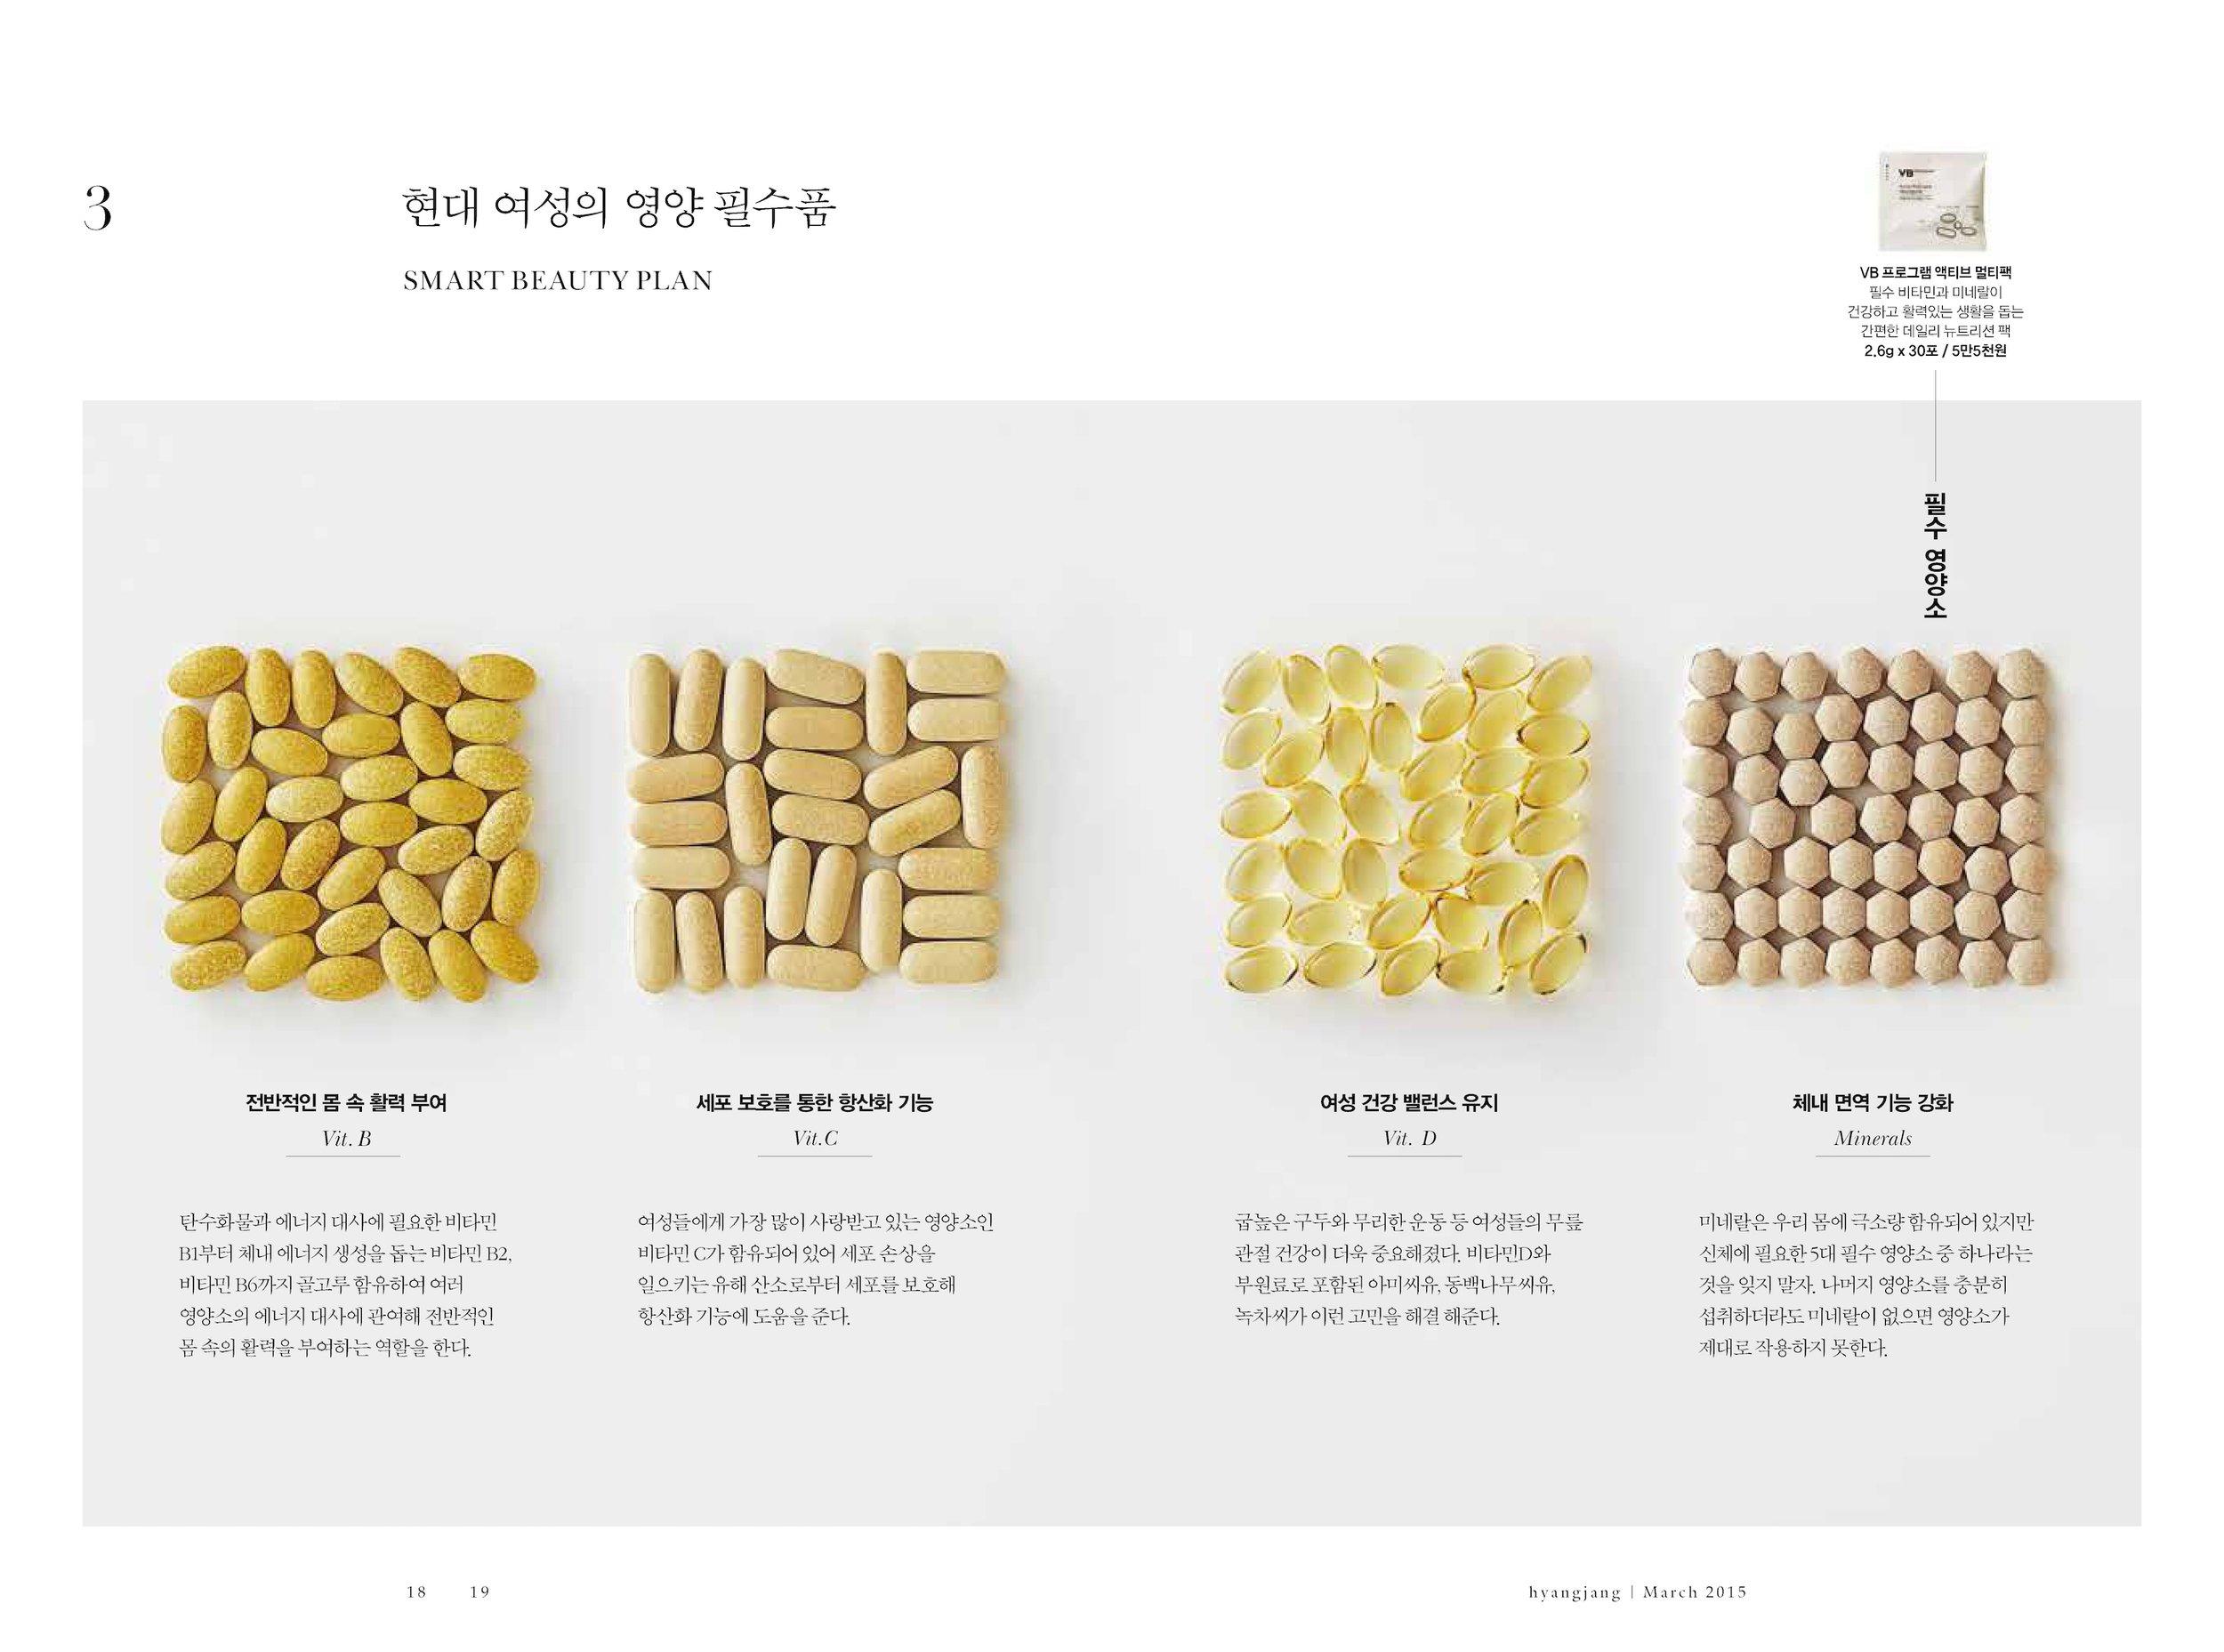 hyangjang-201503_페이지_10.jpeg